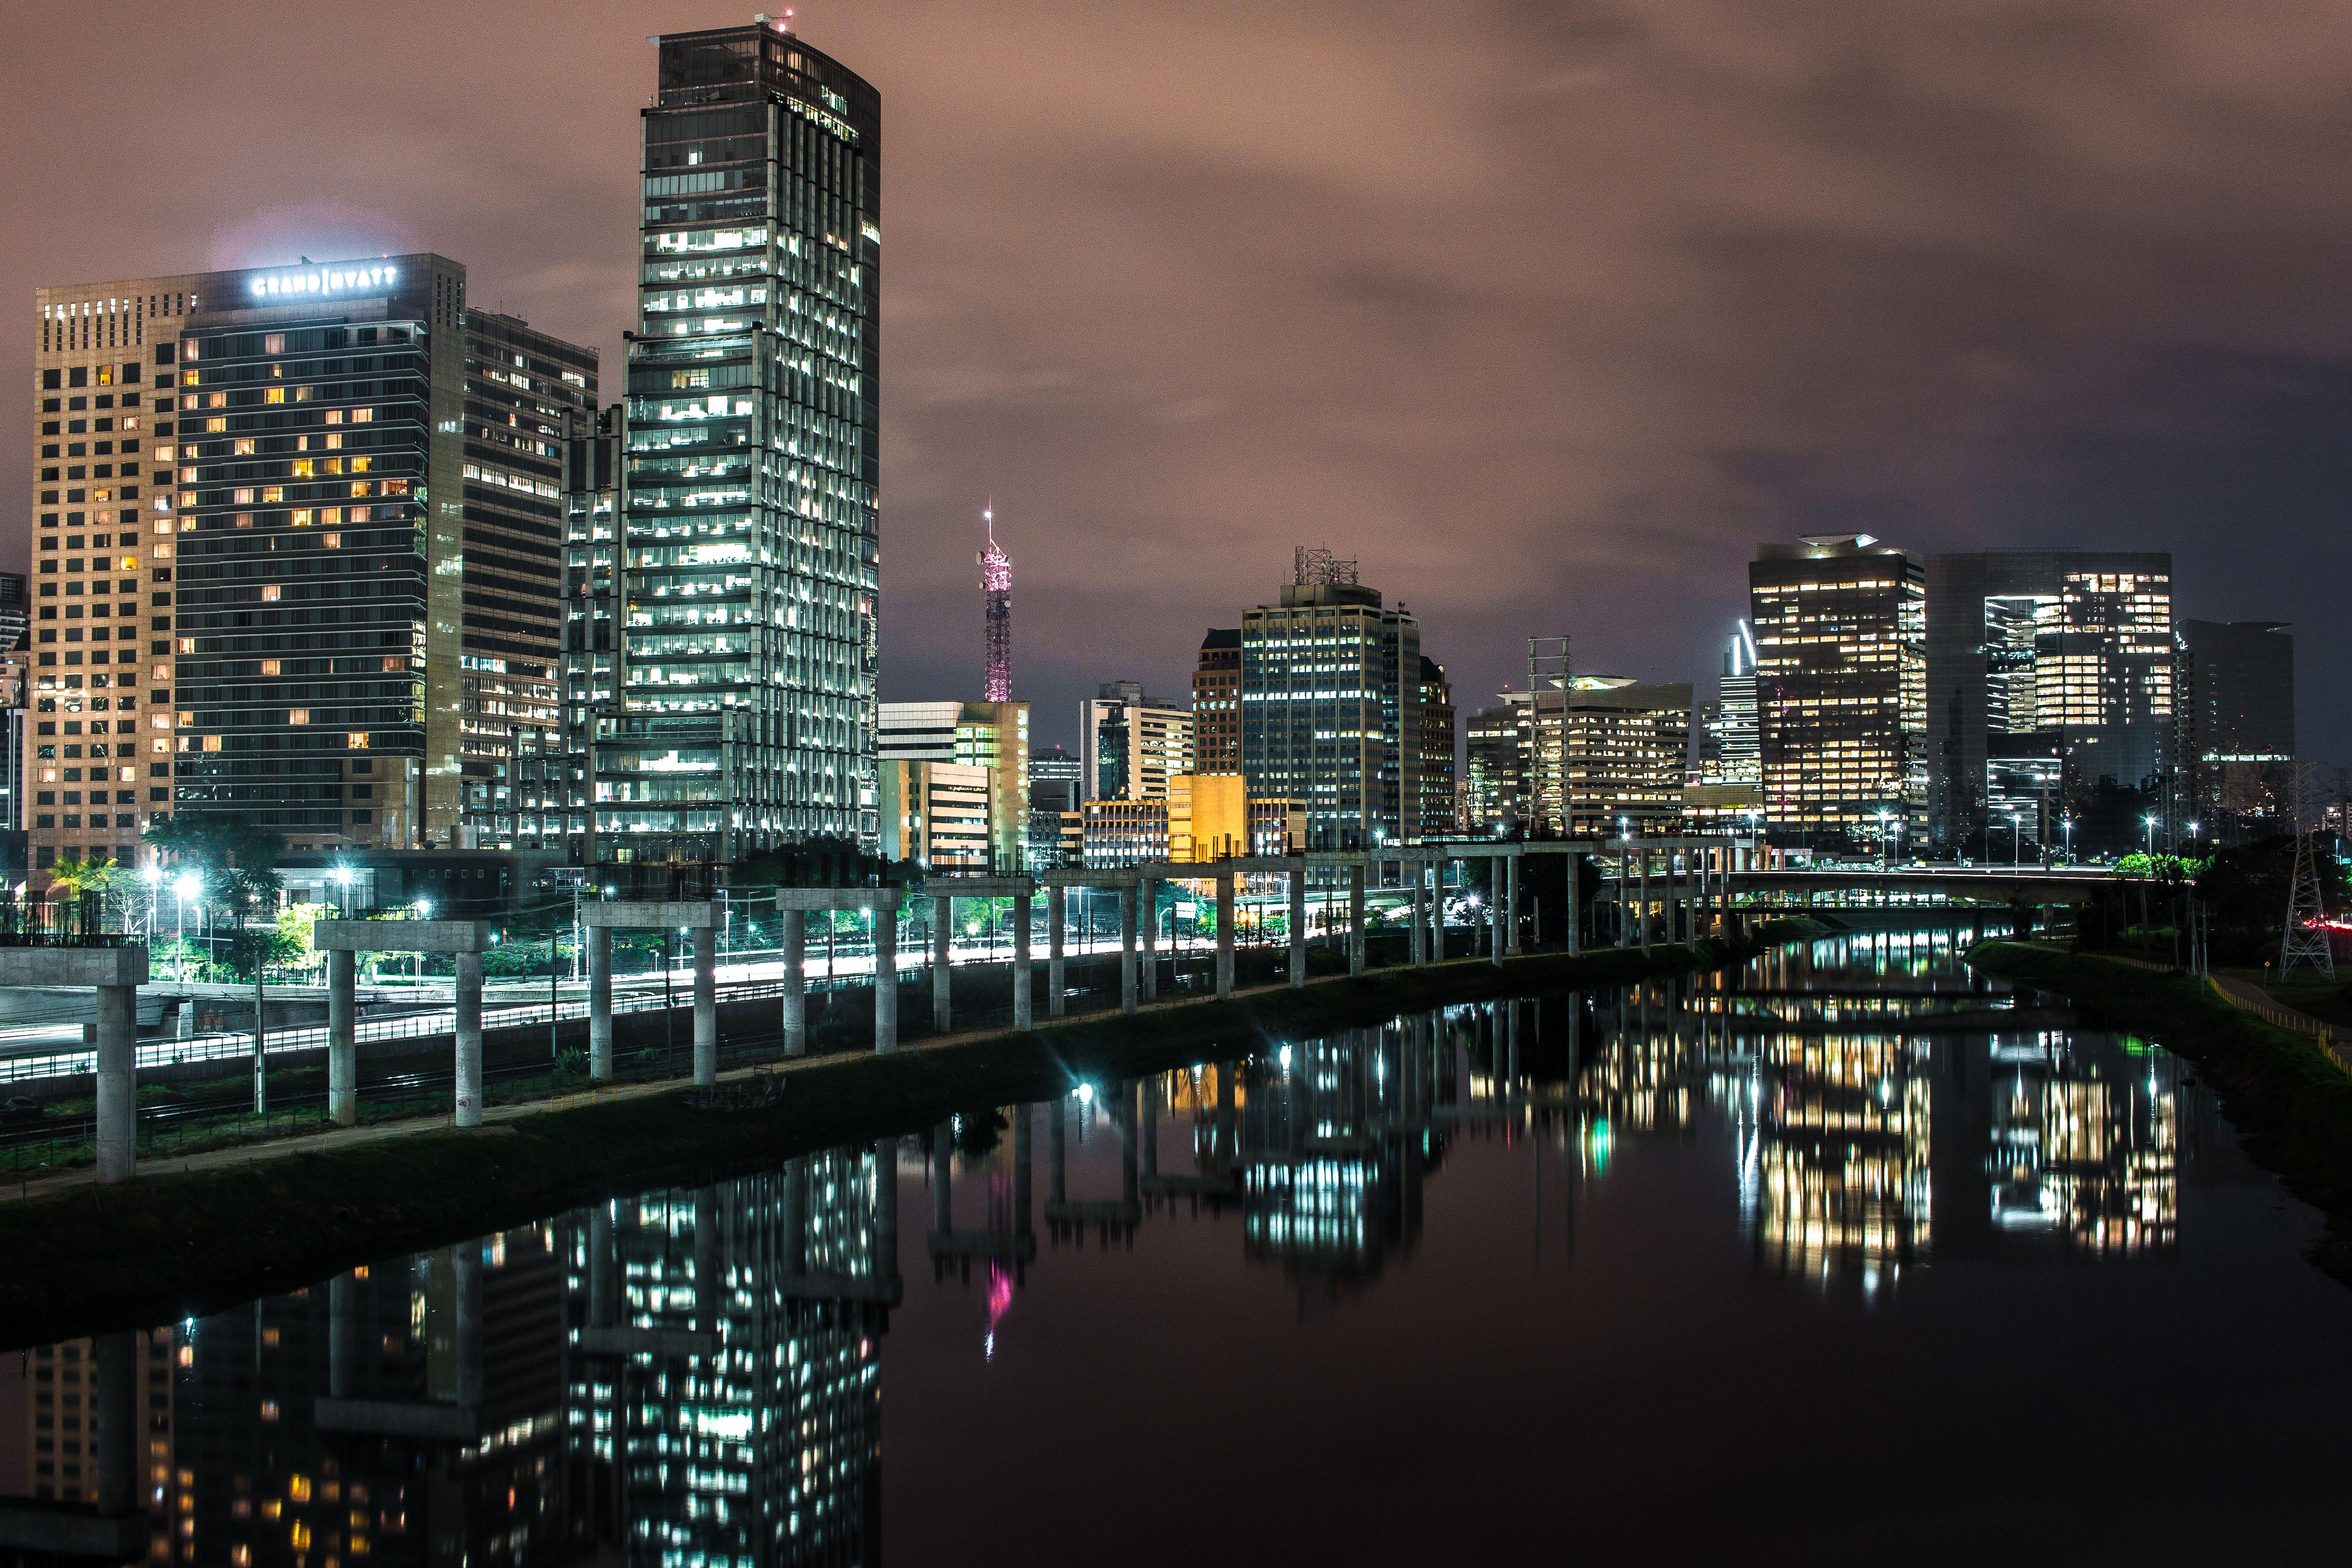 Photographing Cities At Night: Illuminated City At Night · Free Stock Photo